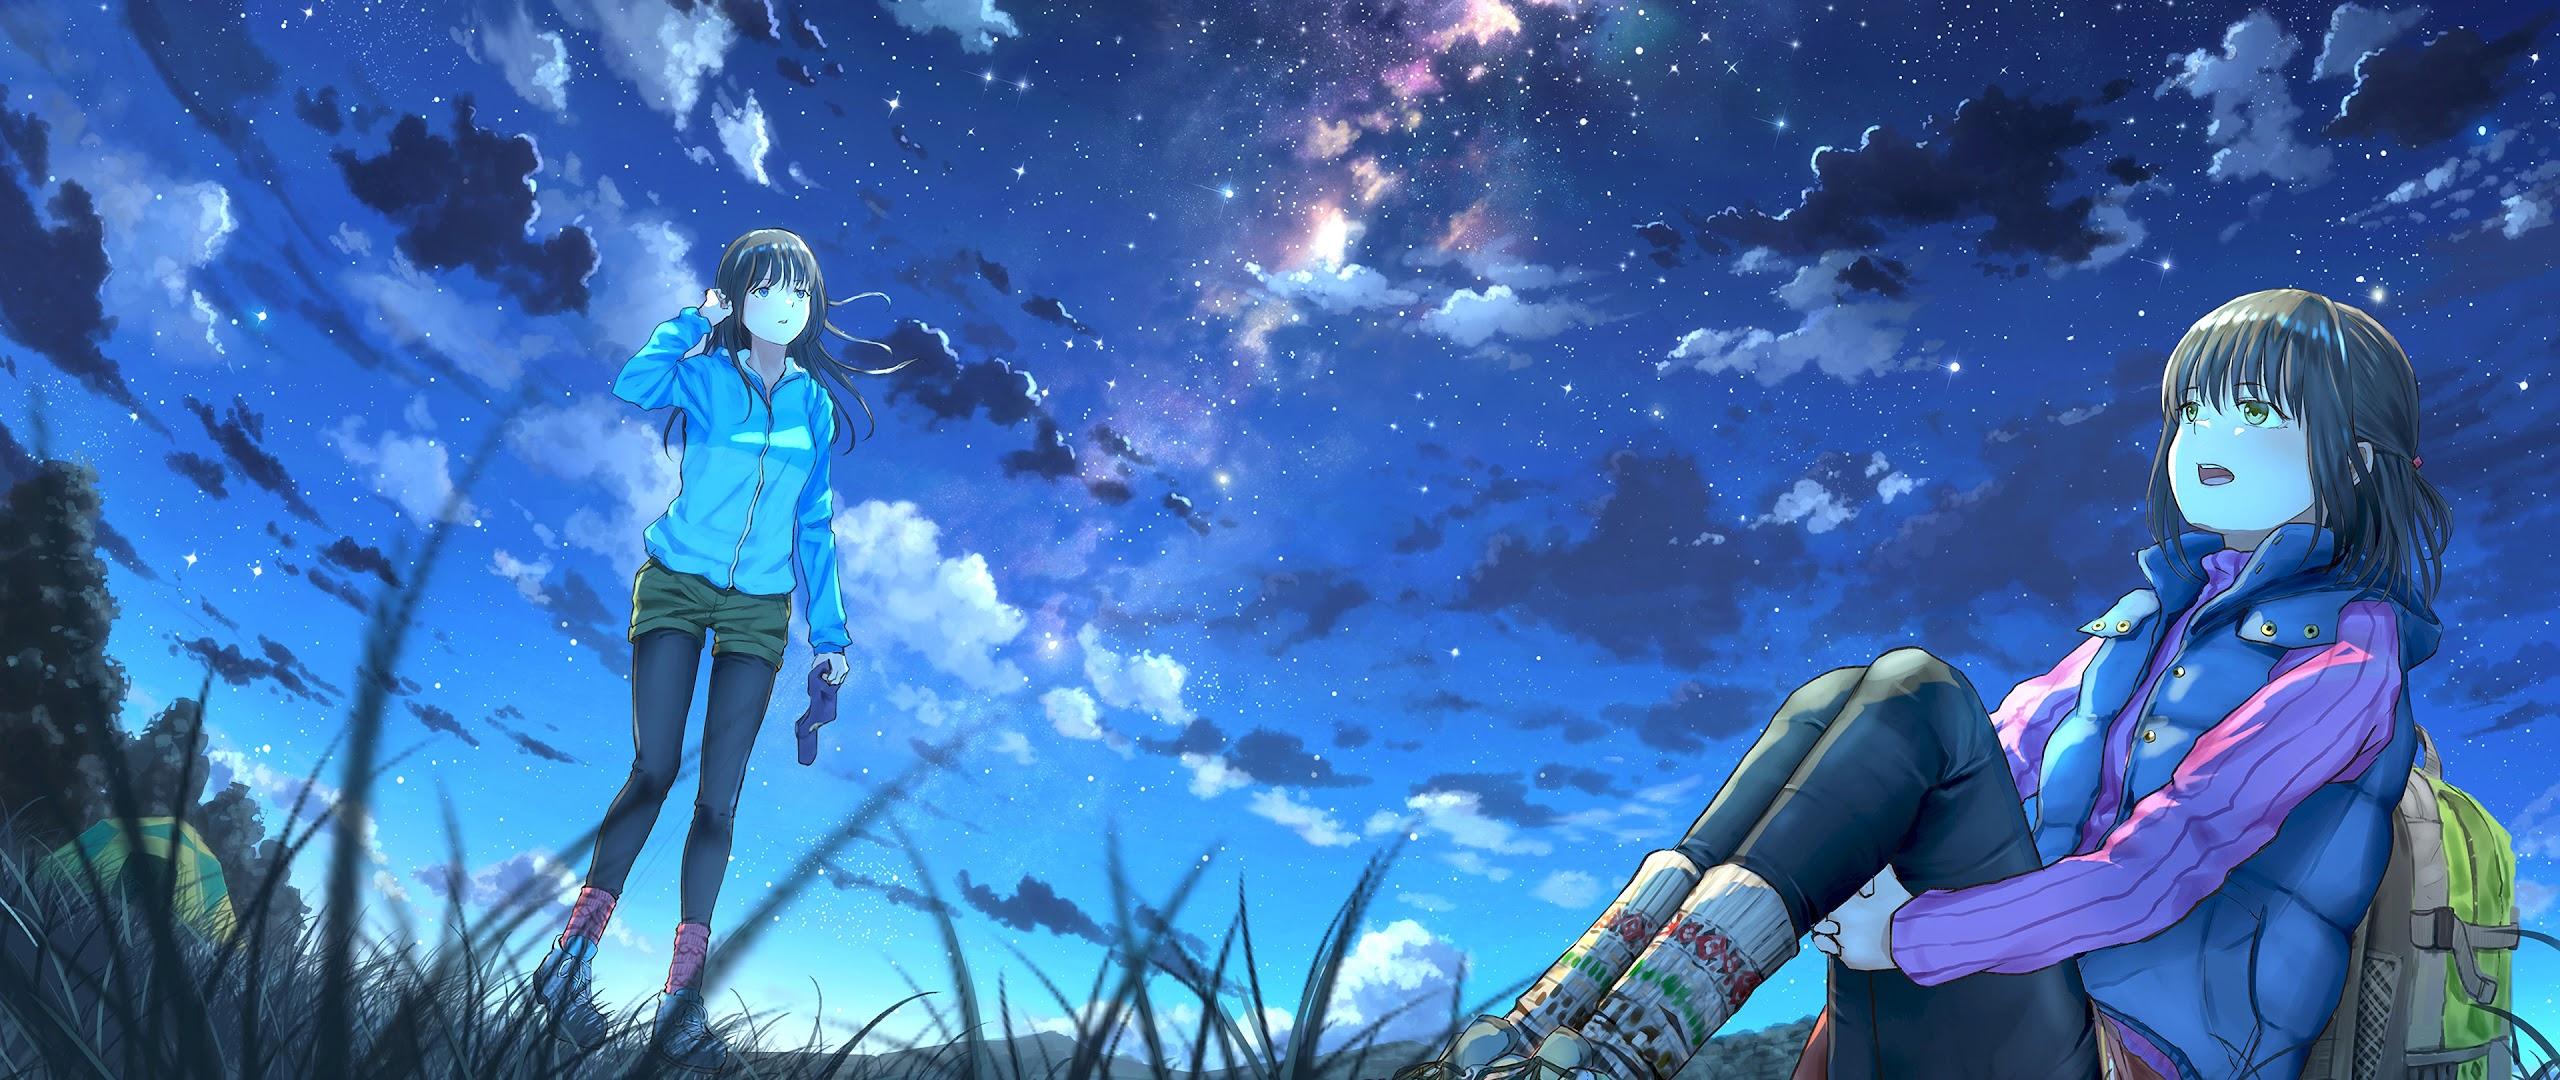 Anime Girls Night Sky Scenery Clouds Stars 4K Wallpaper 64